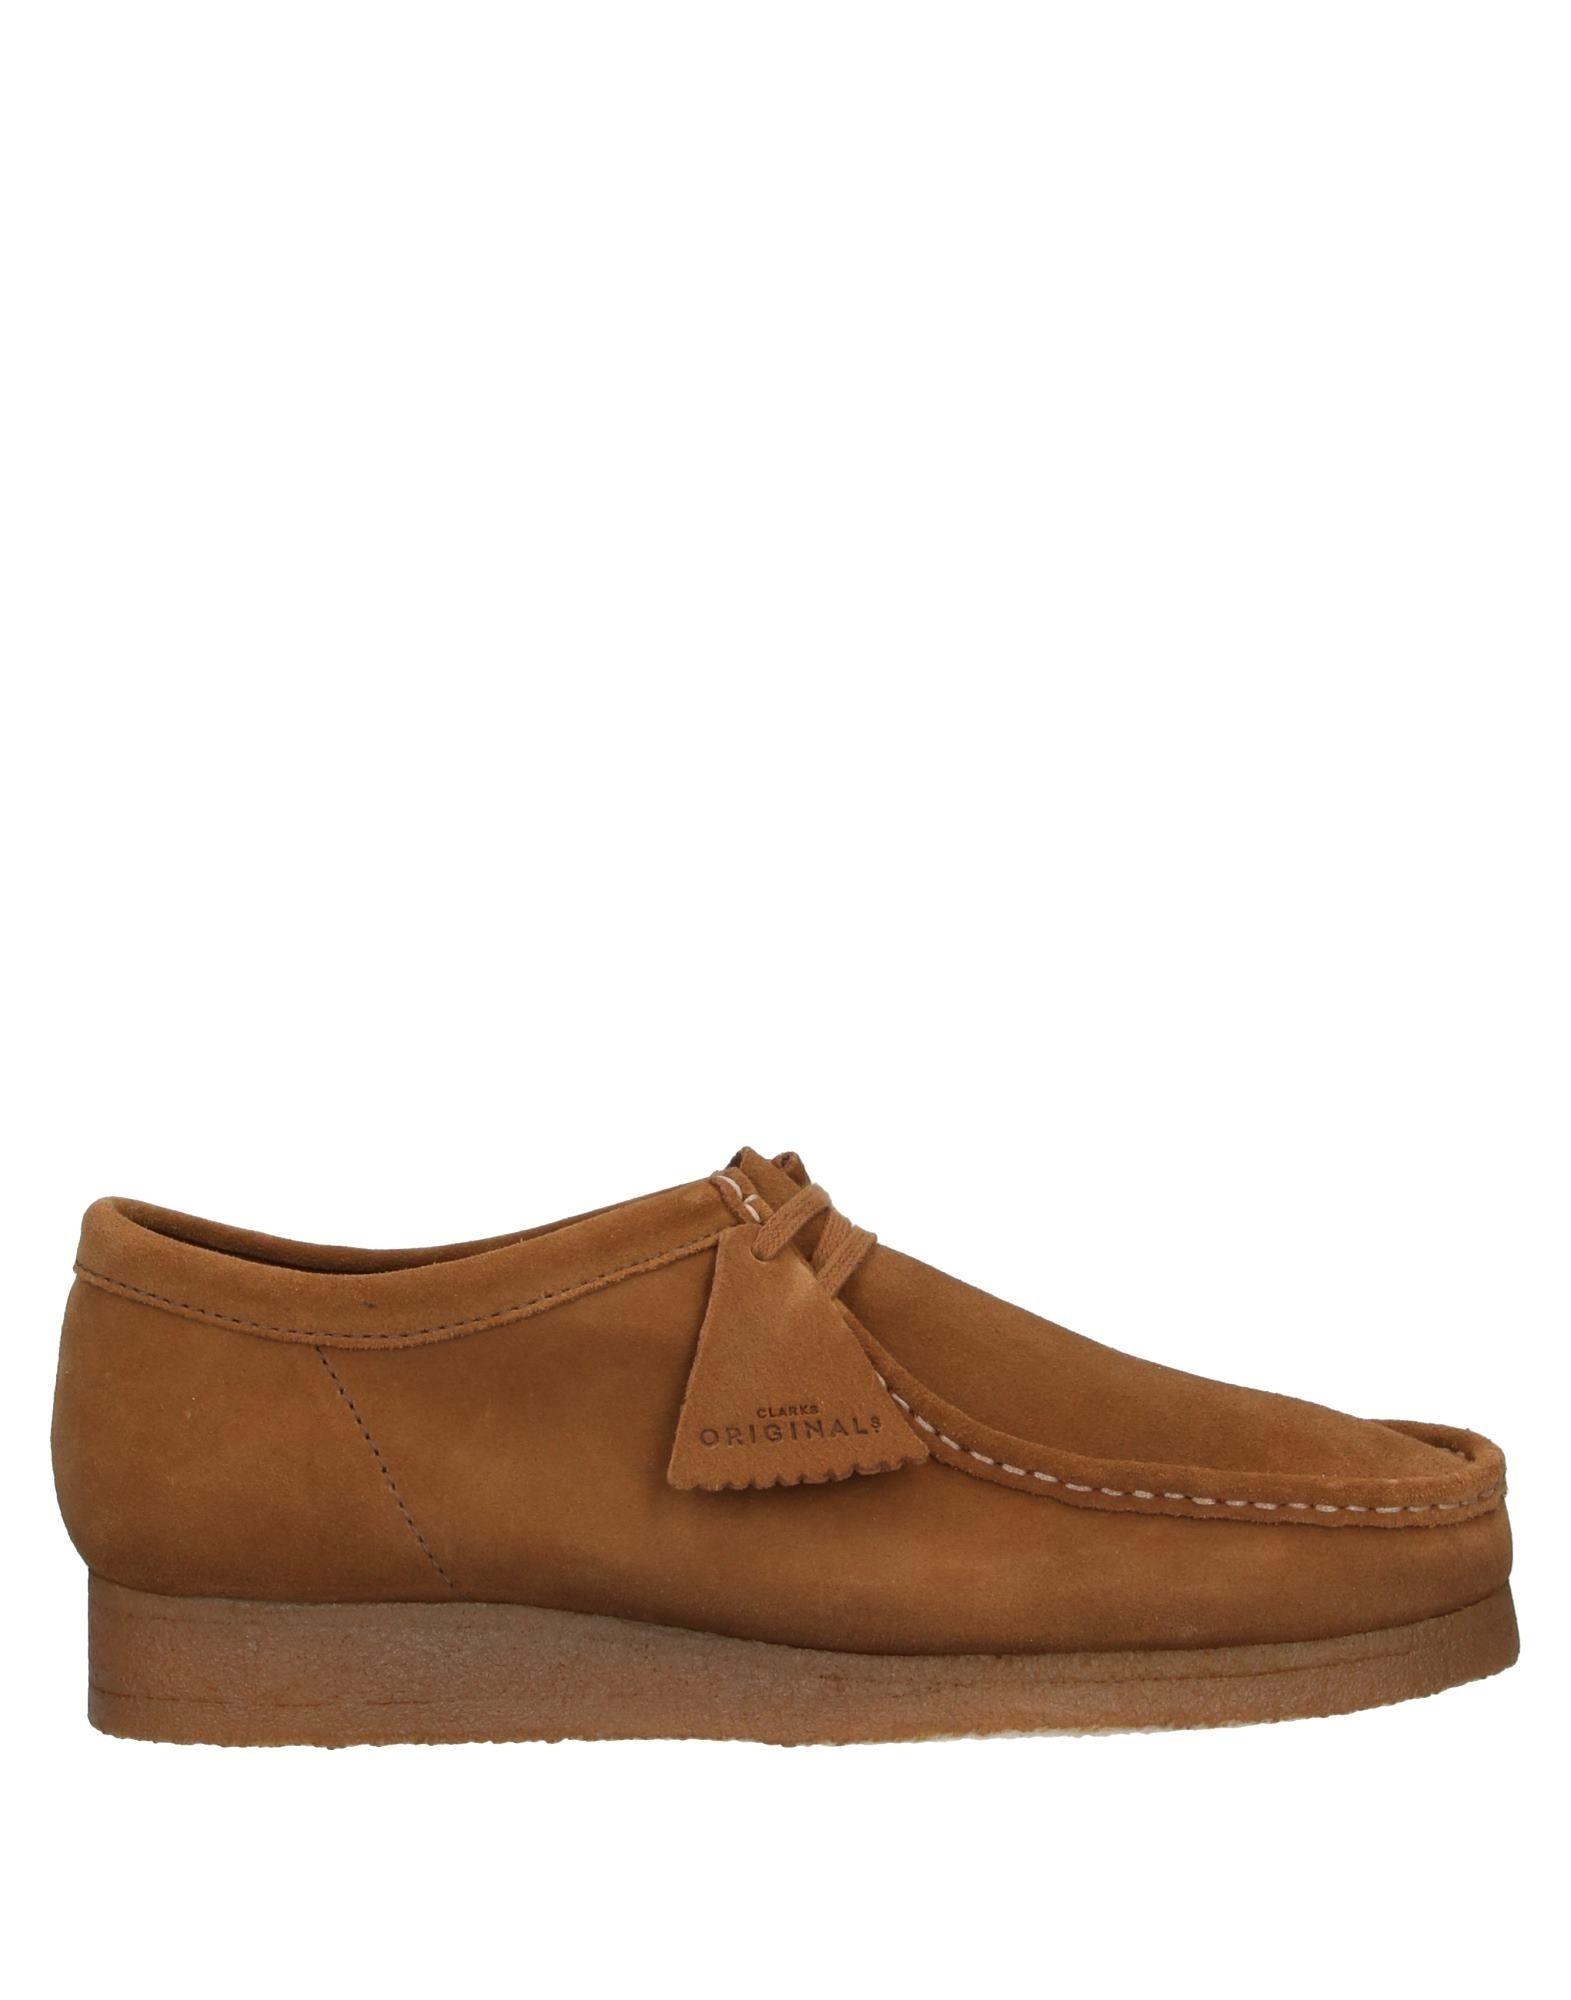 Фото - CLARKS ORIGINALS Обувь на шнурках clarks originals desert boot midnight